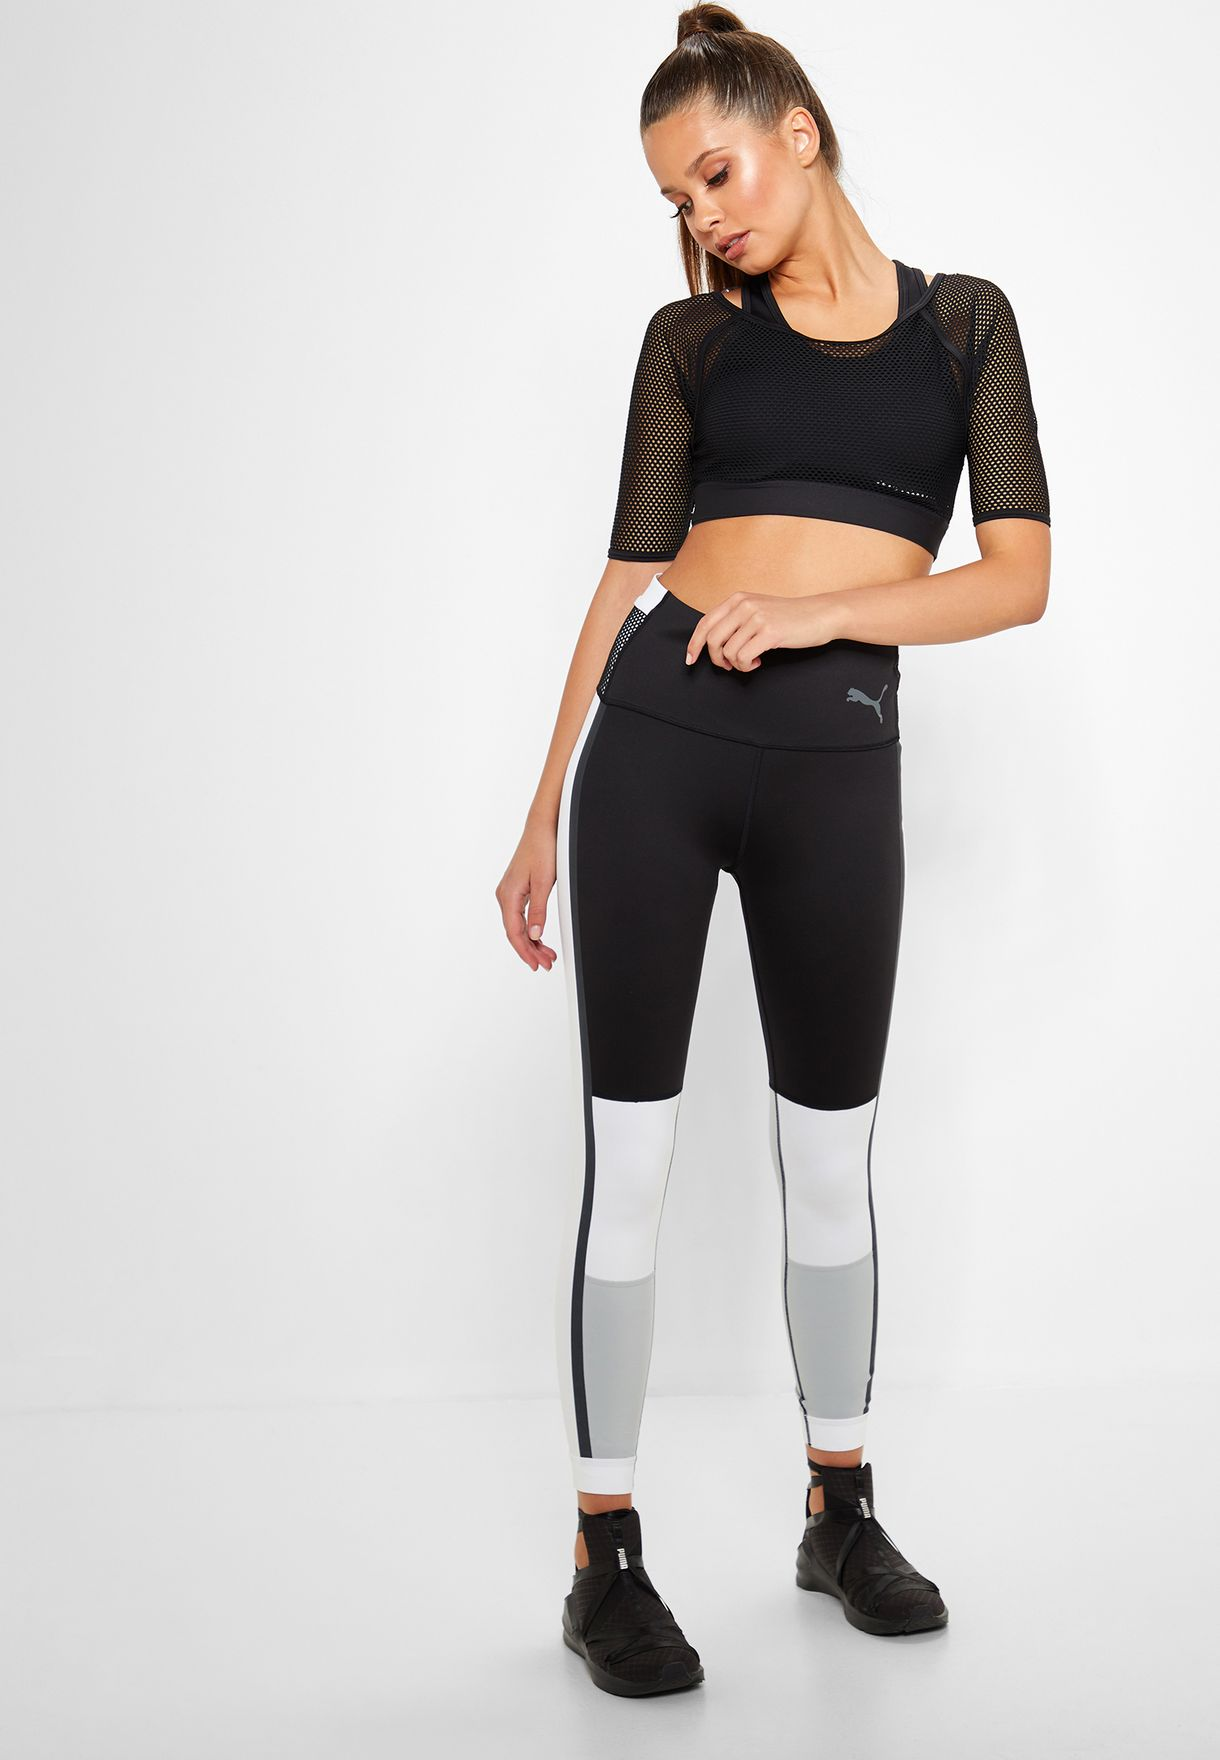 c21911839e42 Shop PUMA black Selena Gomez 7 8 Leggings 51780601 for Women in UAE ...